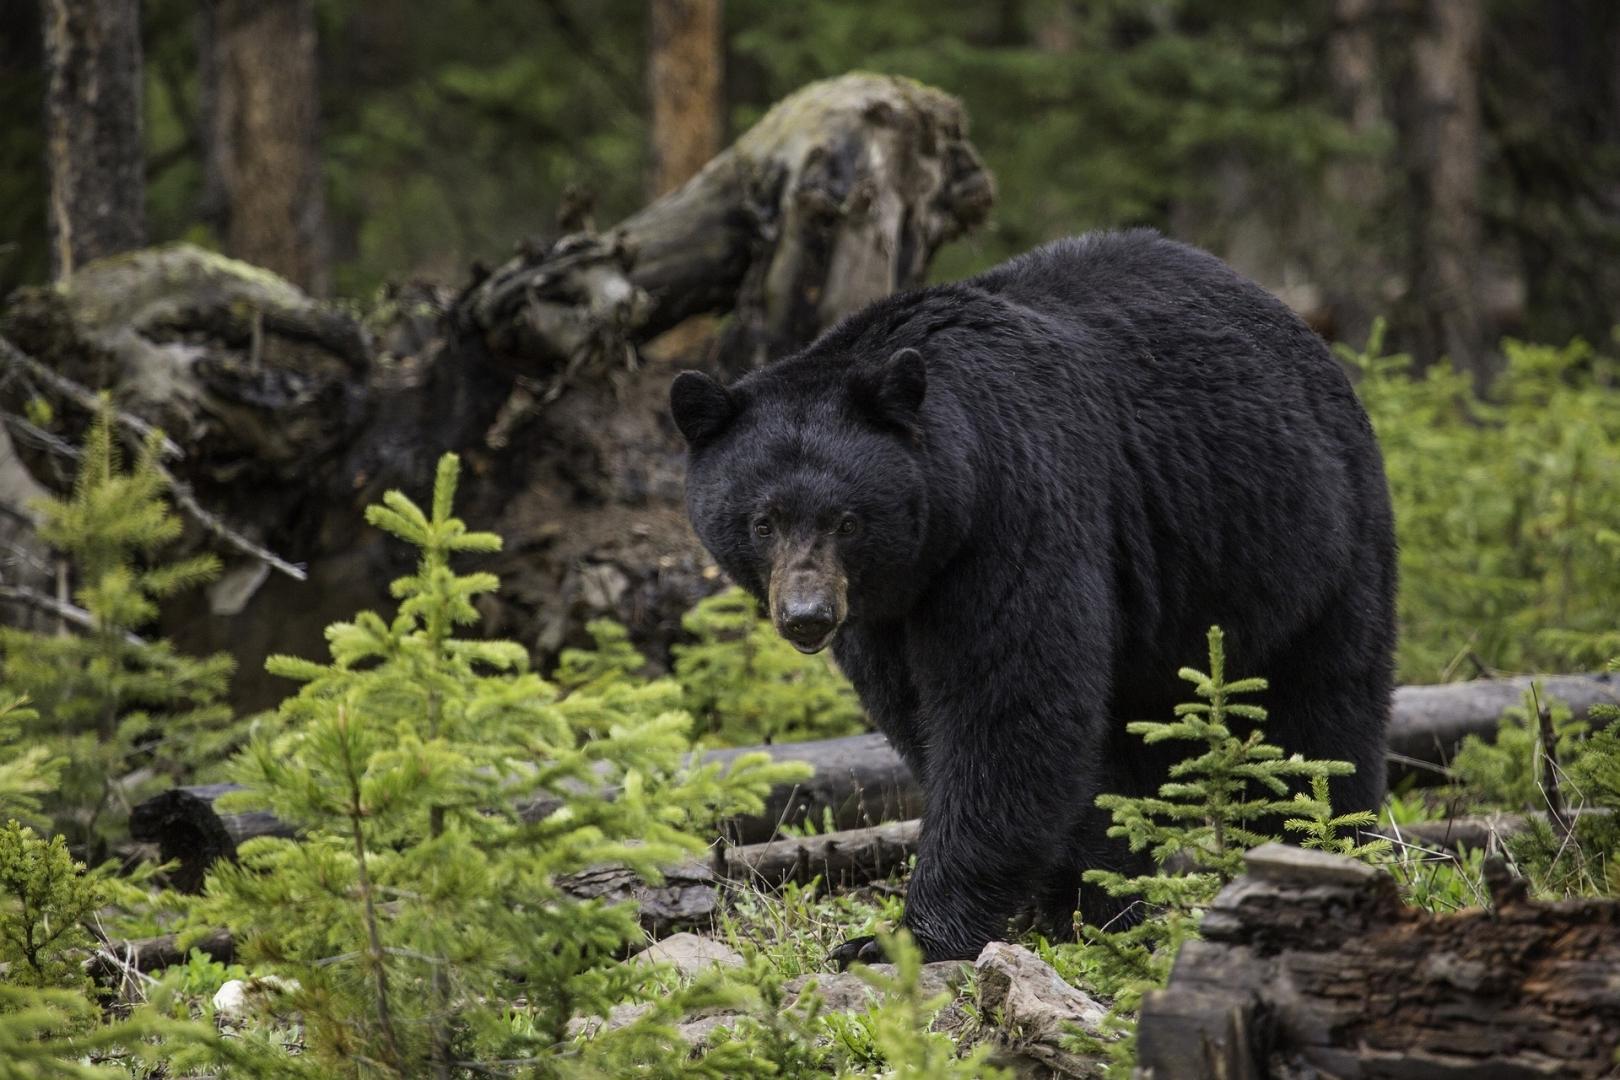 так нужен медведи в америке картинки говорите хотя